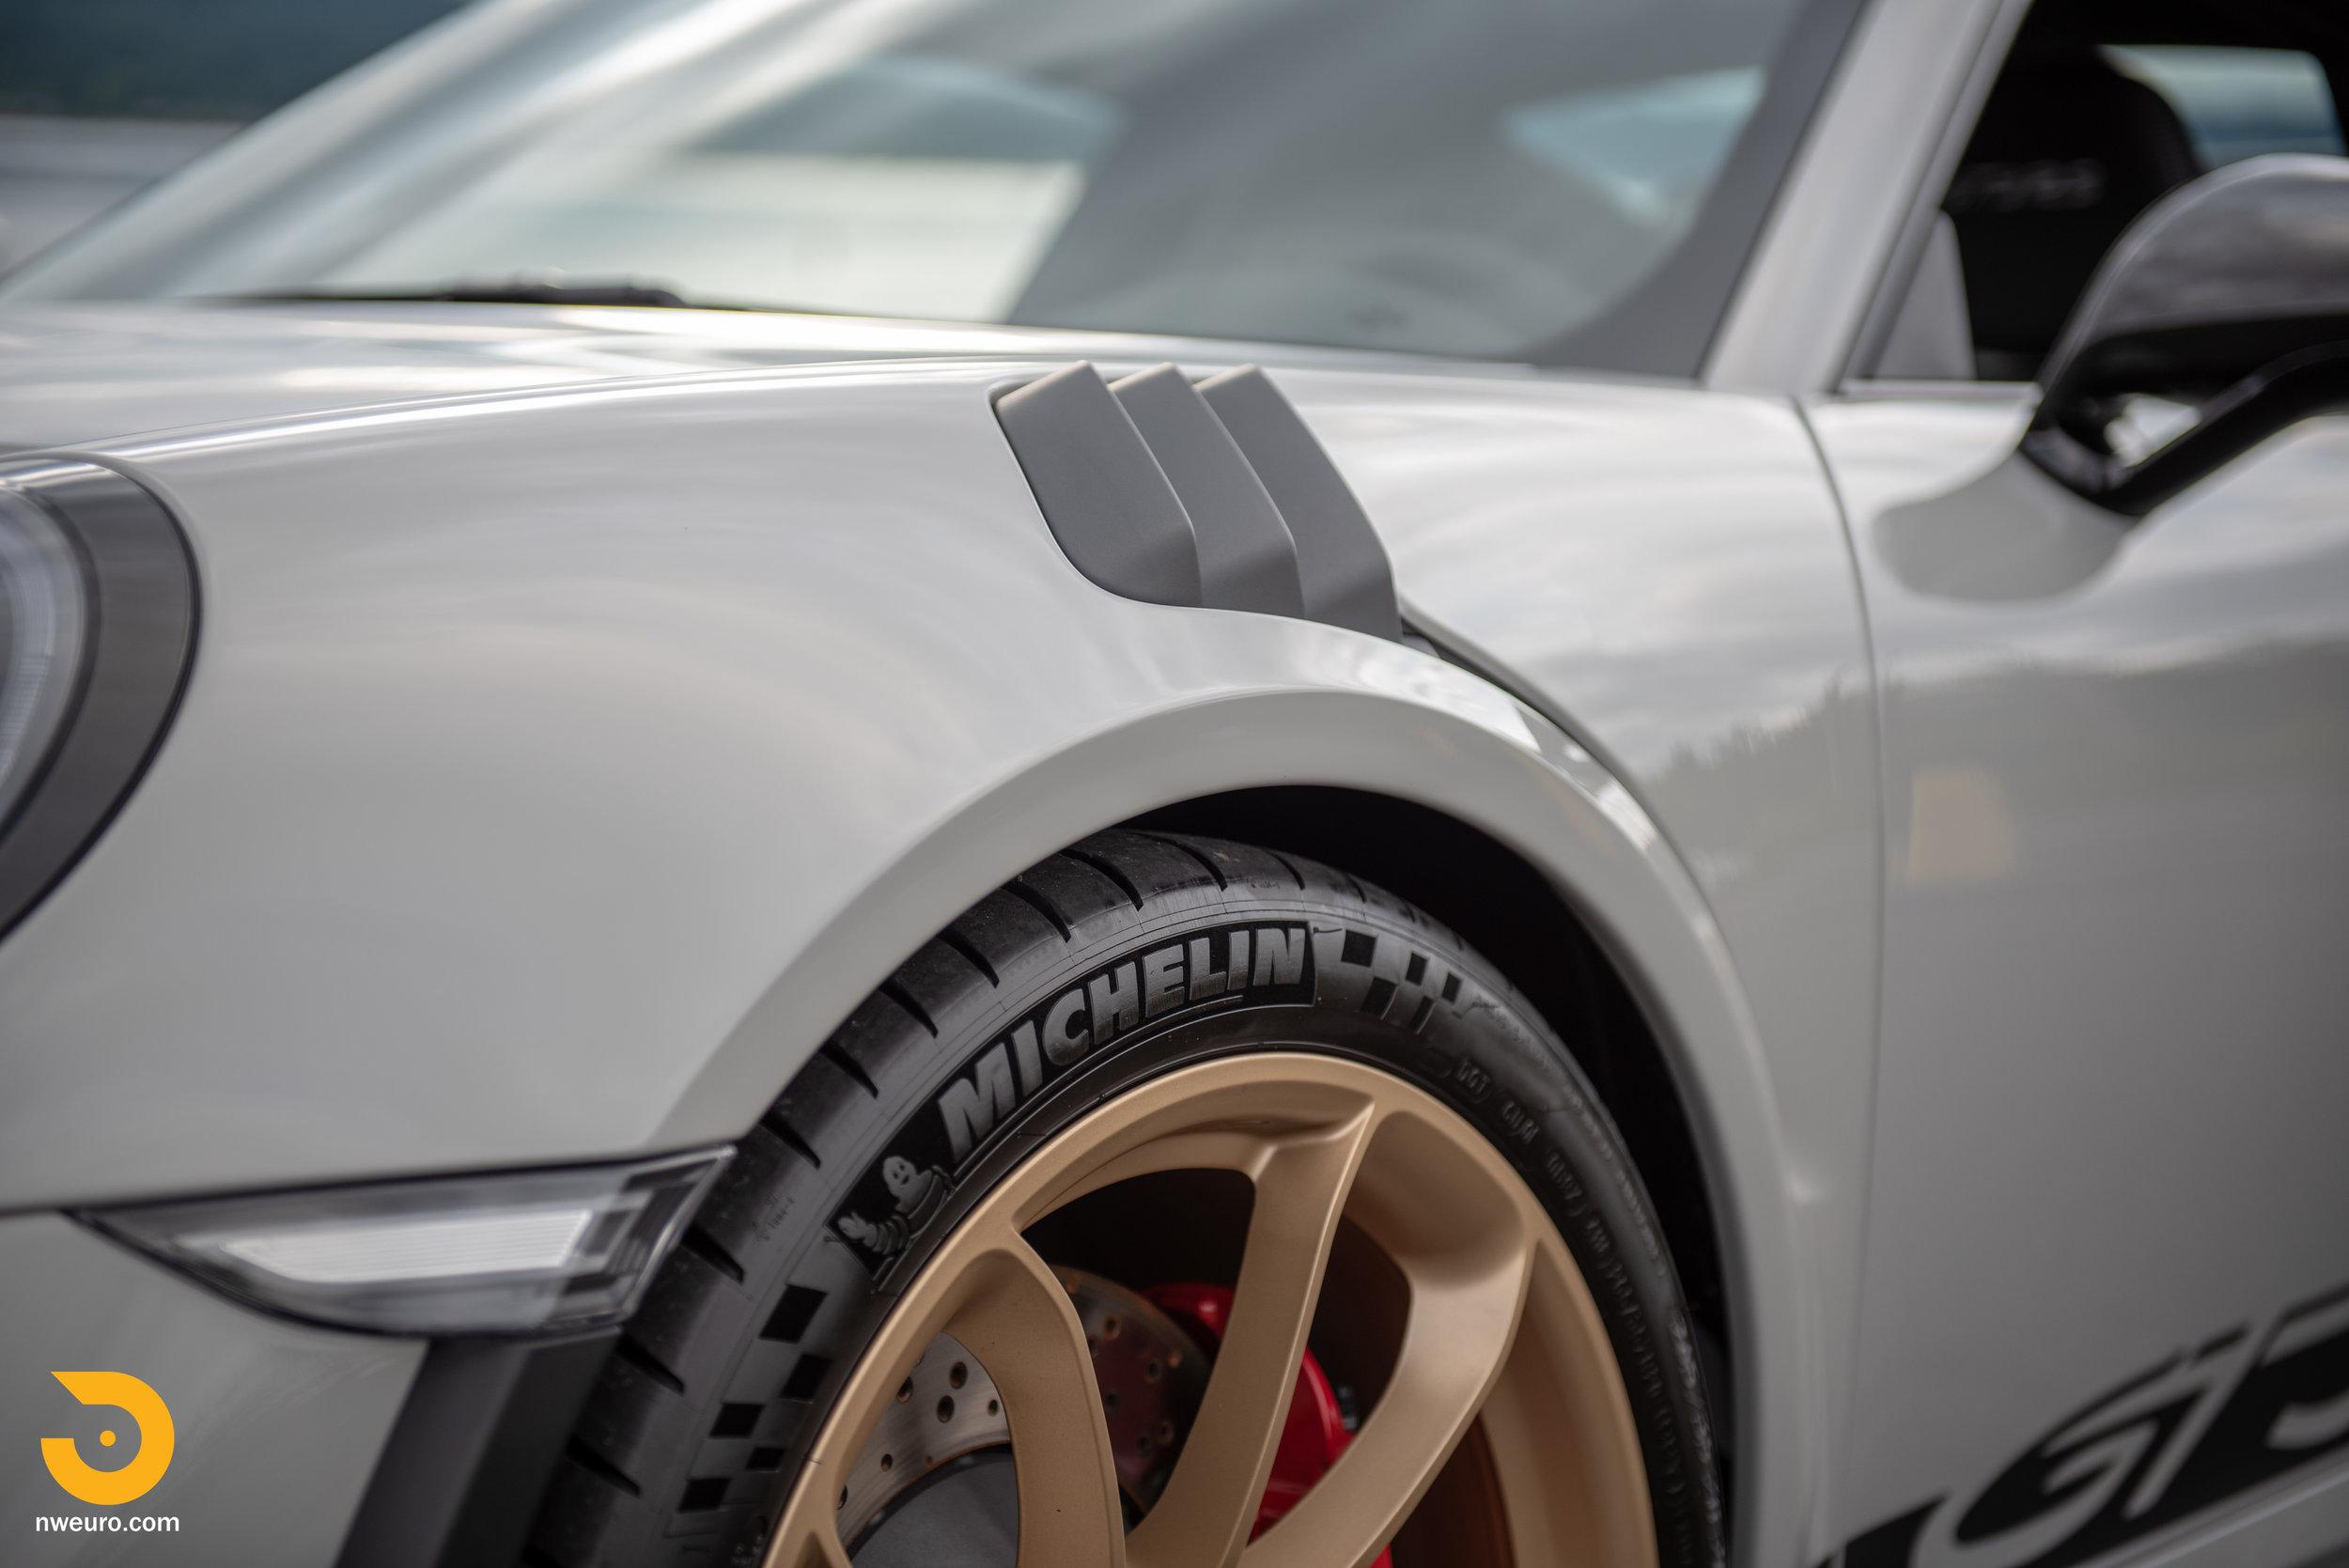 2019 Porsche GT3 RS - Chalk-23.jpg